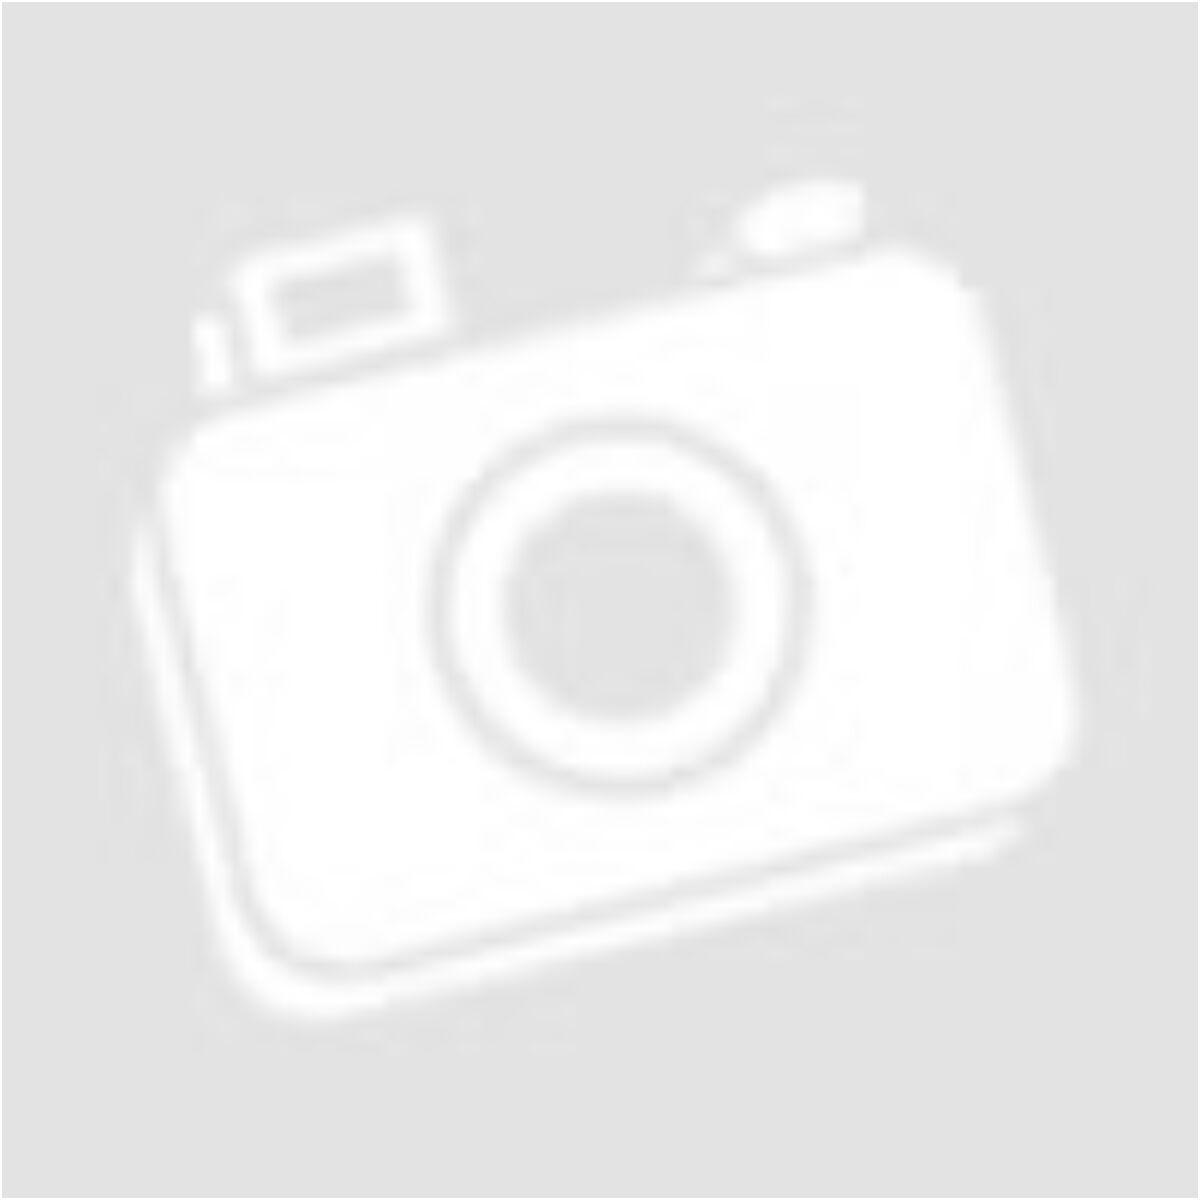 Xiaomi Mi Router AloT Router AX3600 EU DVB4251GL